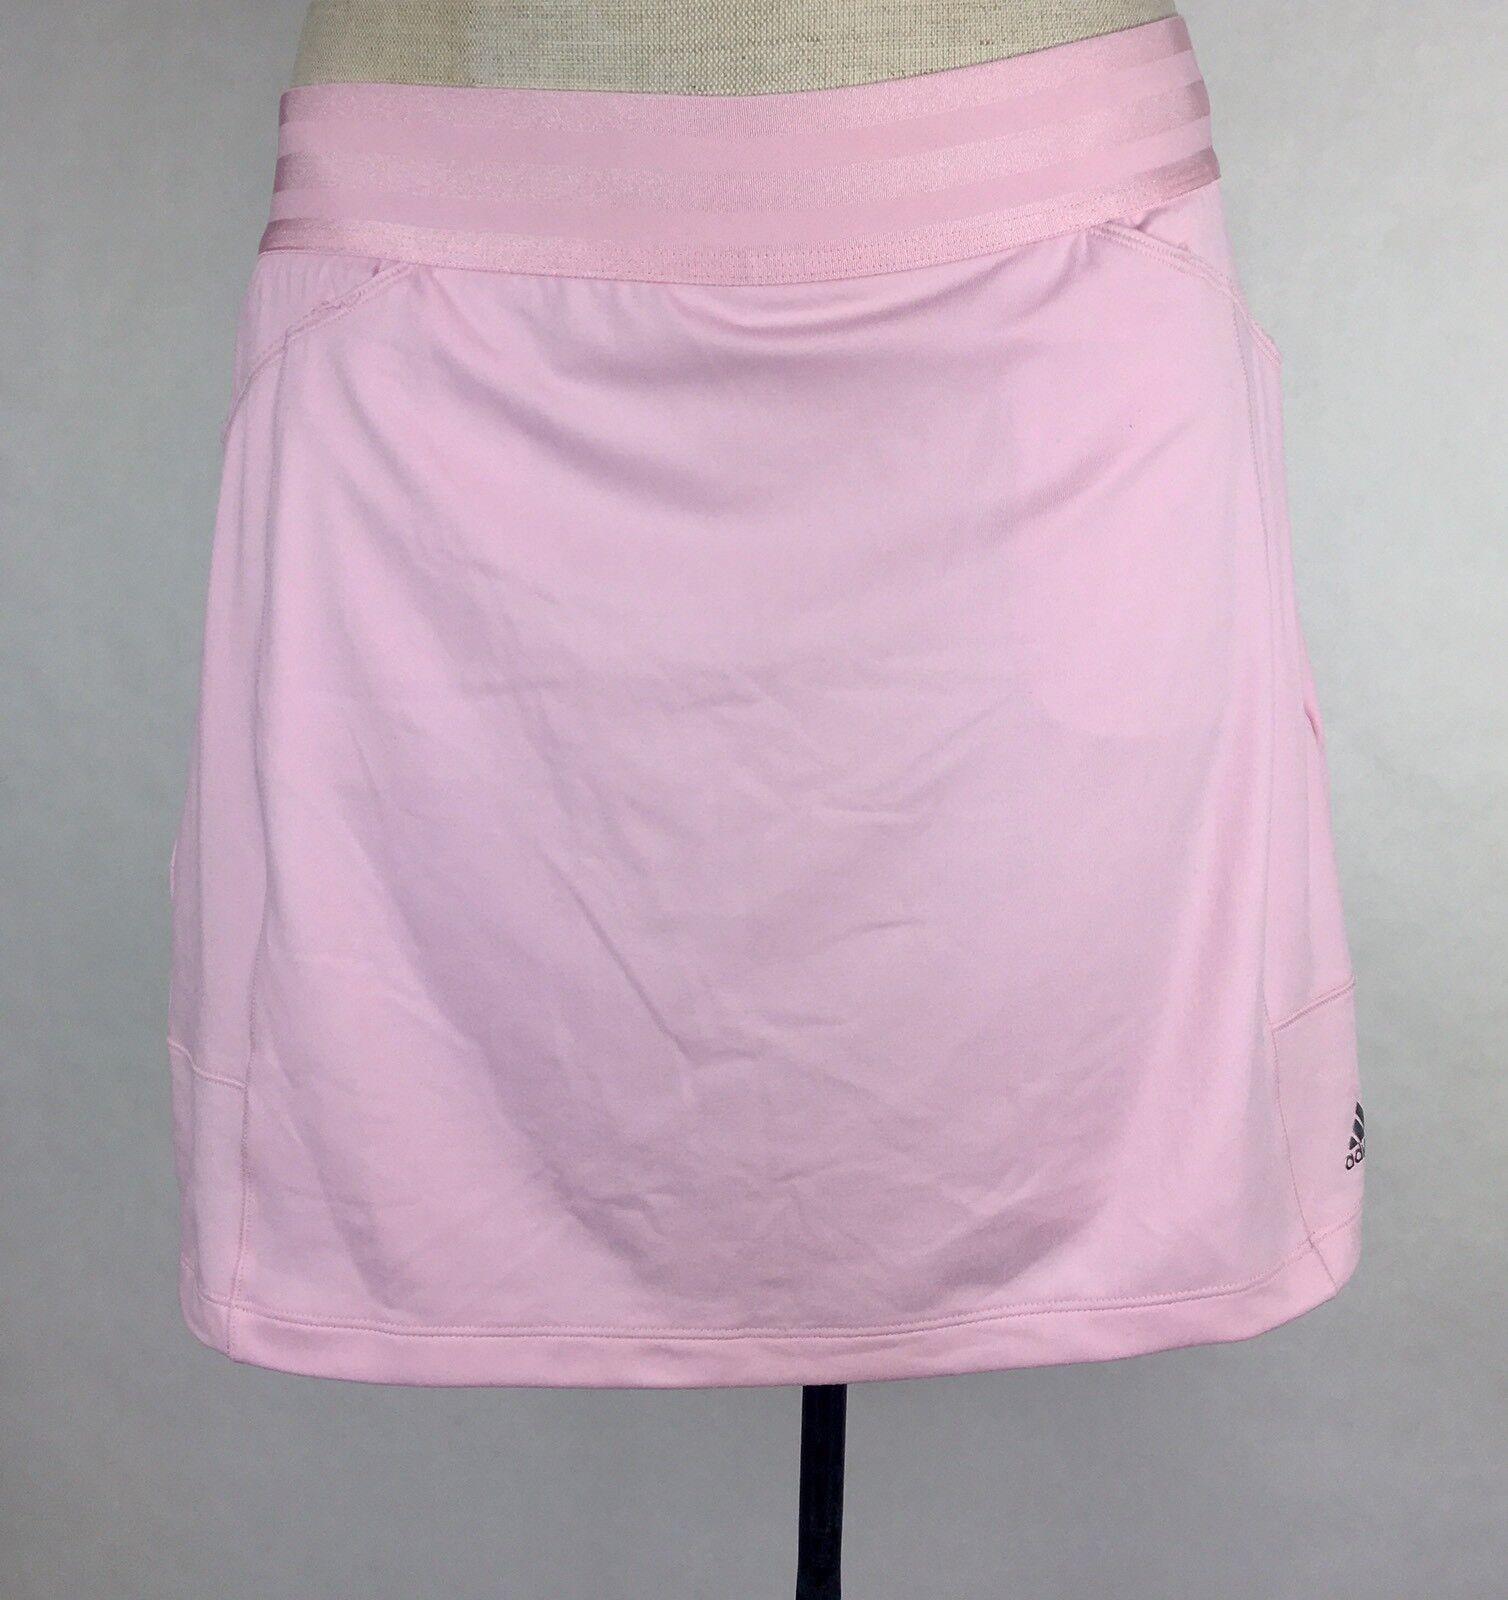 Damen Adidas Climacool Golf Skort Rock in Stretch-Shorts Größe S